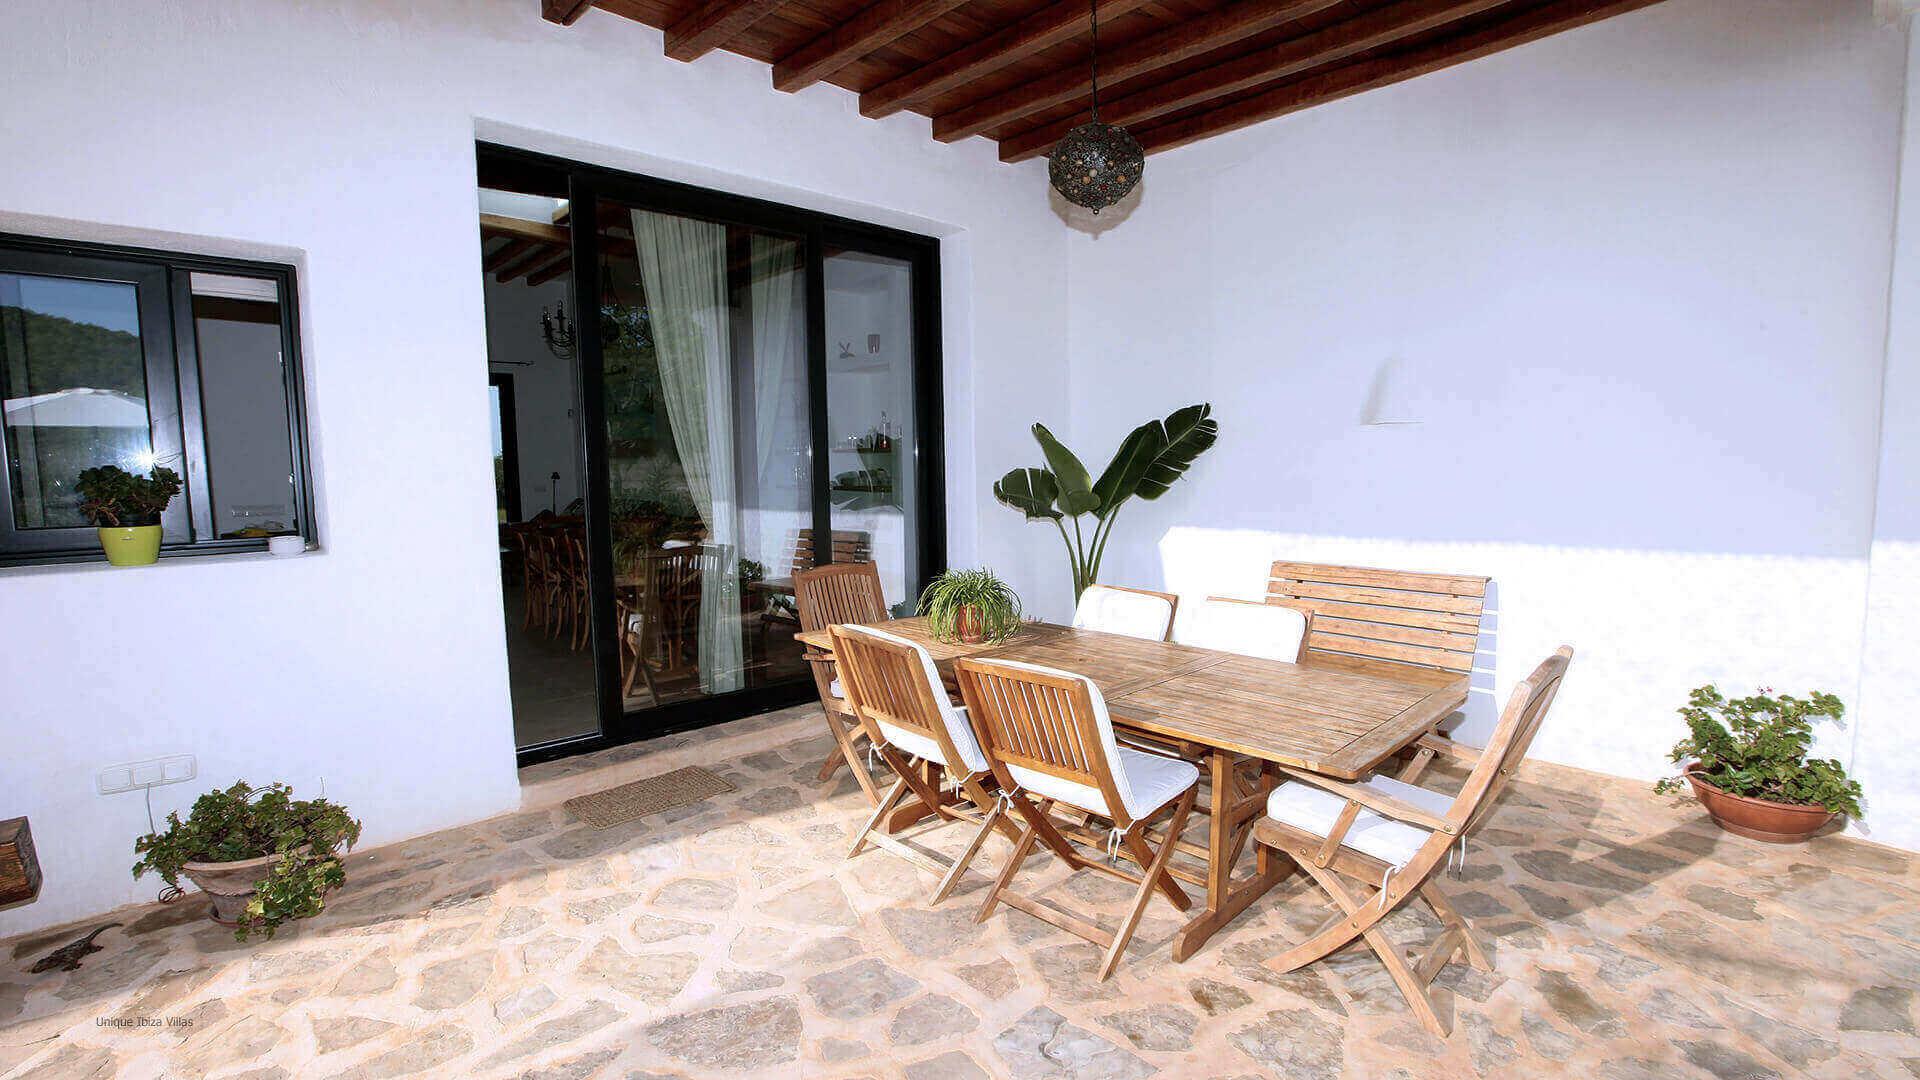 Cana Marieta Ibiza Villa 9 Near San Miguel